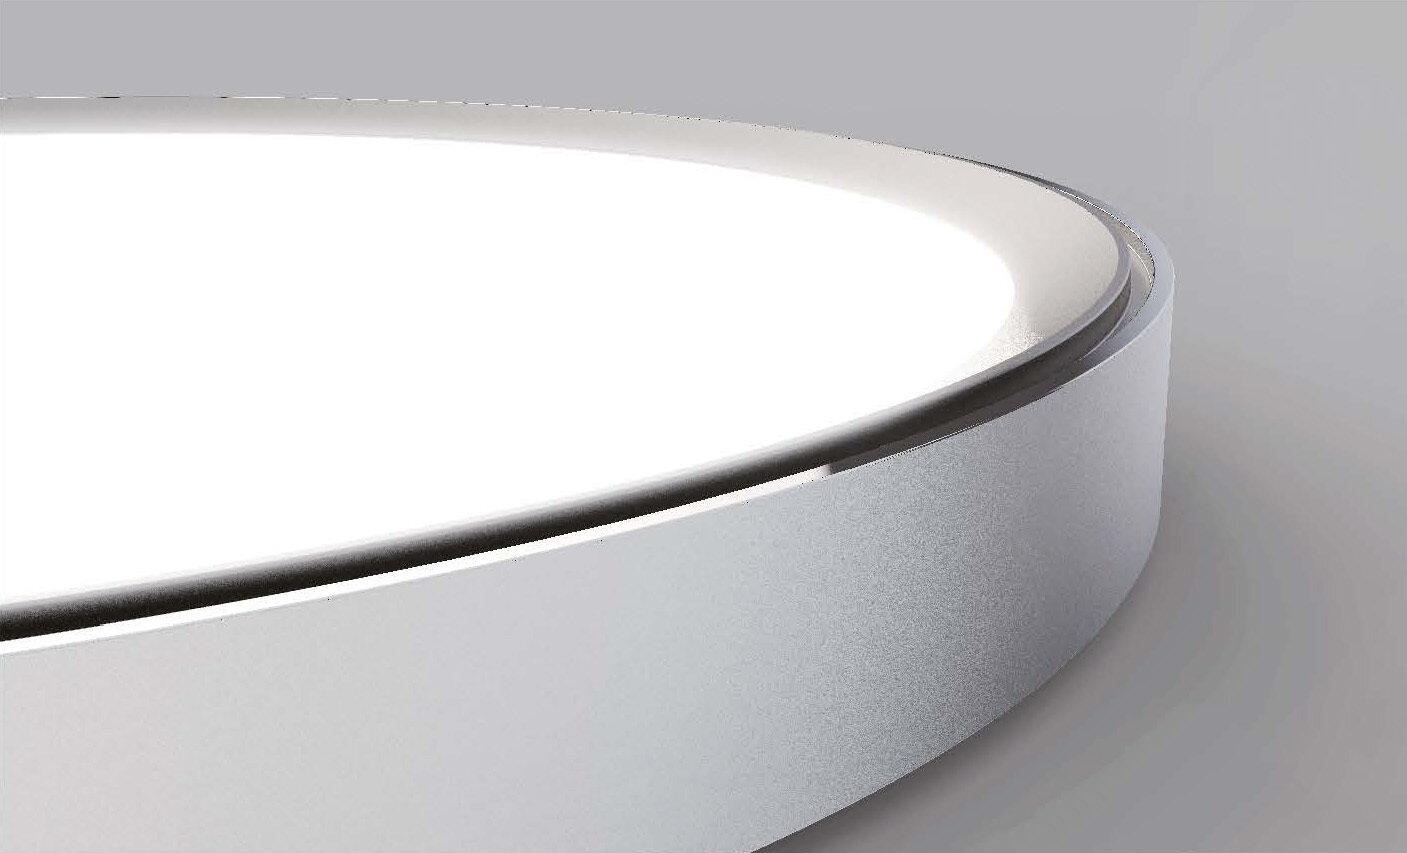 ProLuce® CODONE Aufbau-/Hängeleuchte 50W, weiss, 3000K, 4800 Lm, Ø550x44 mm, B.light, DALI